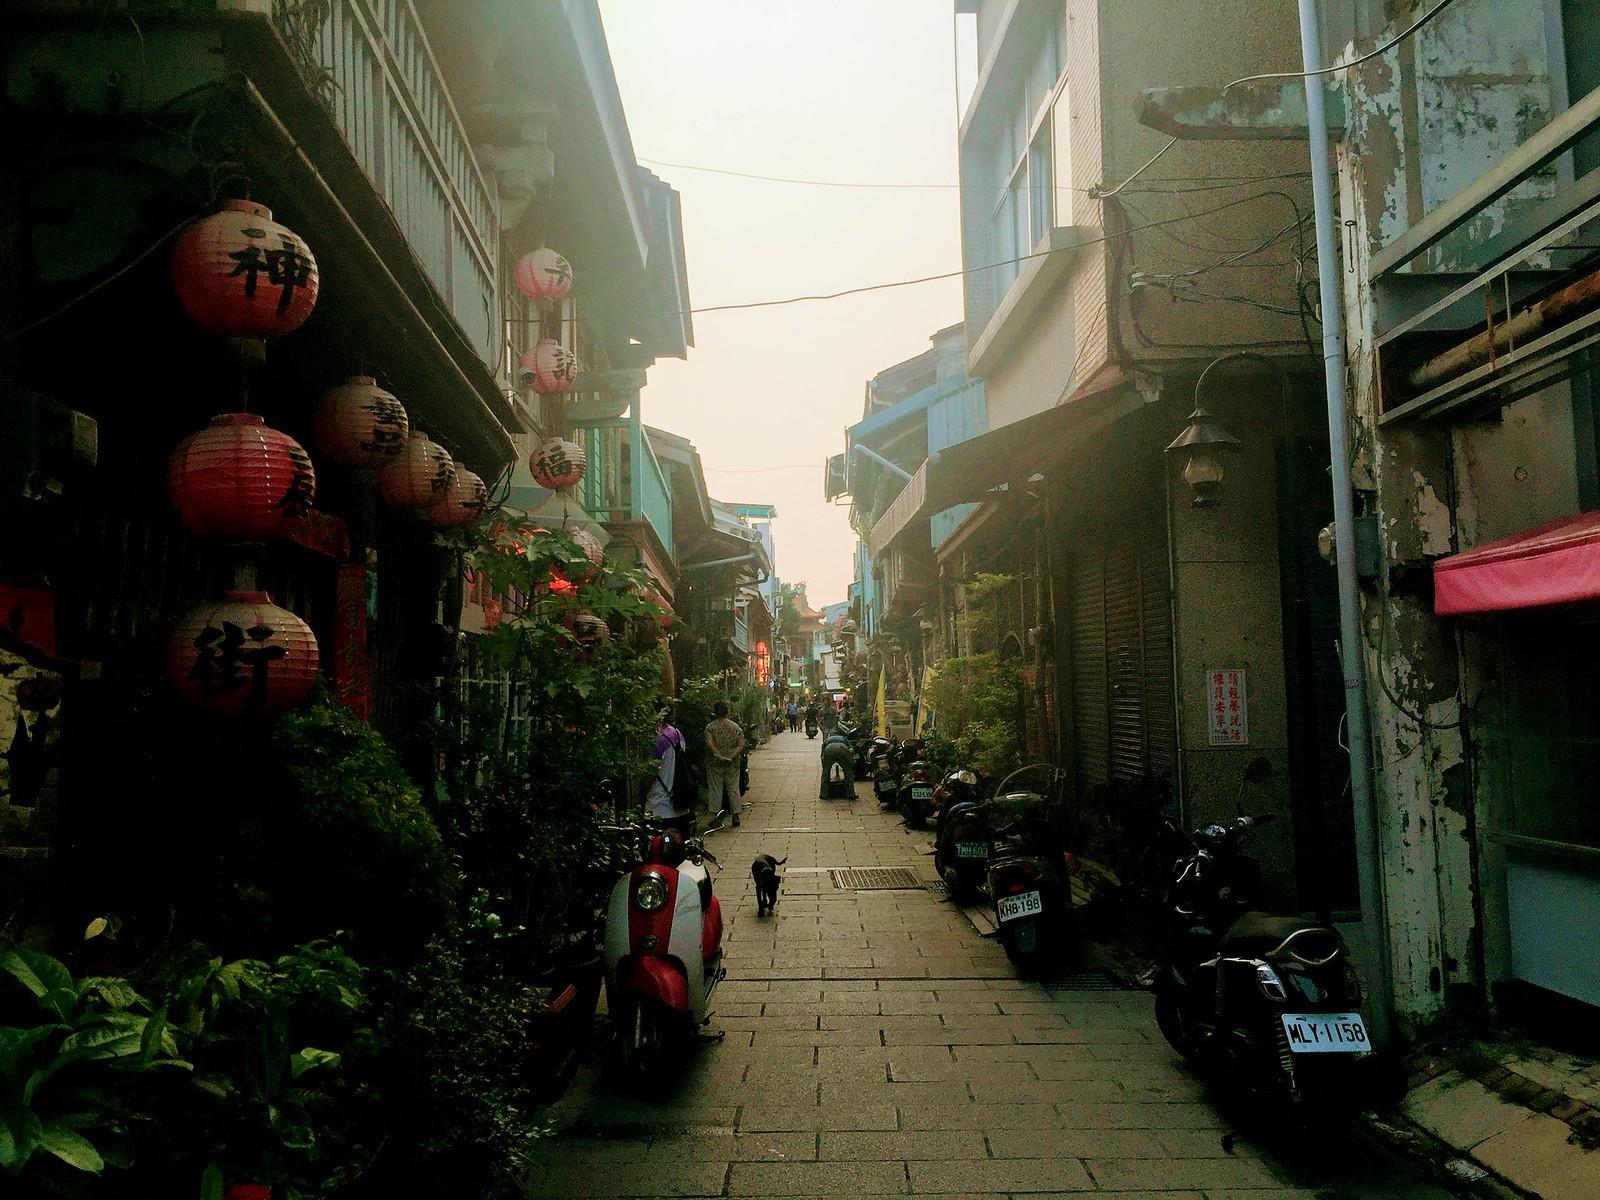 Shannong Street